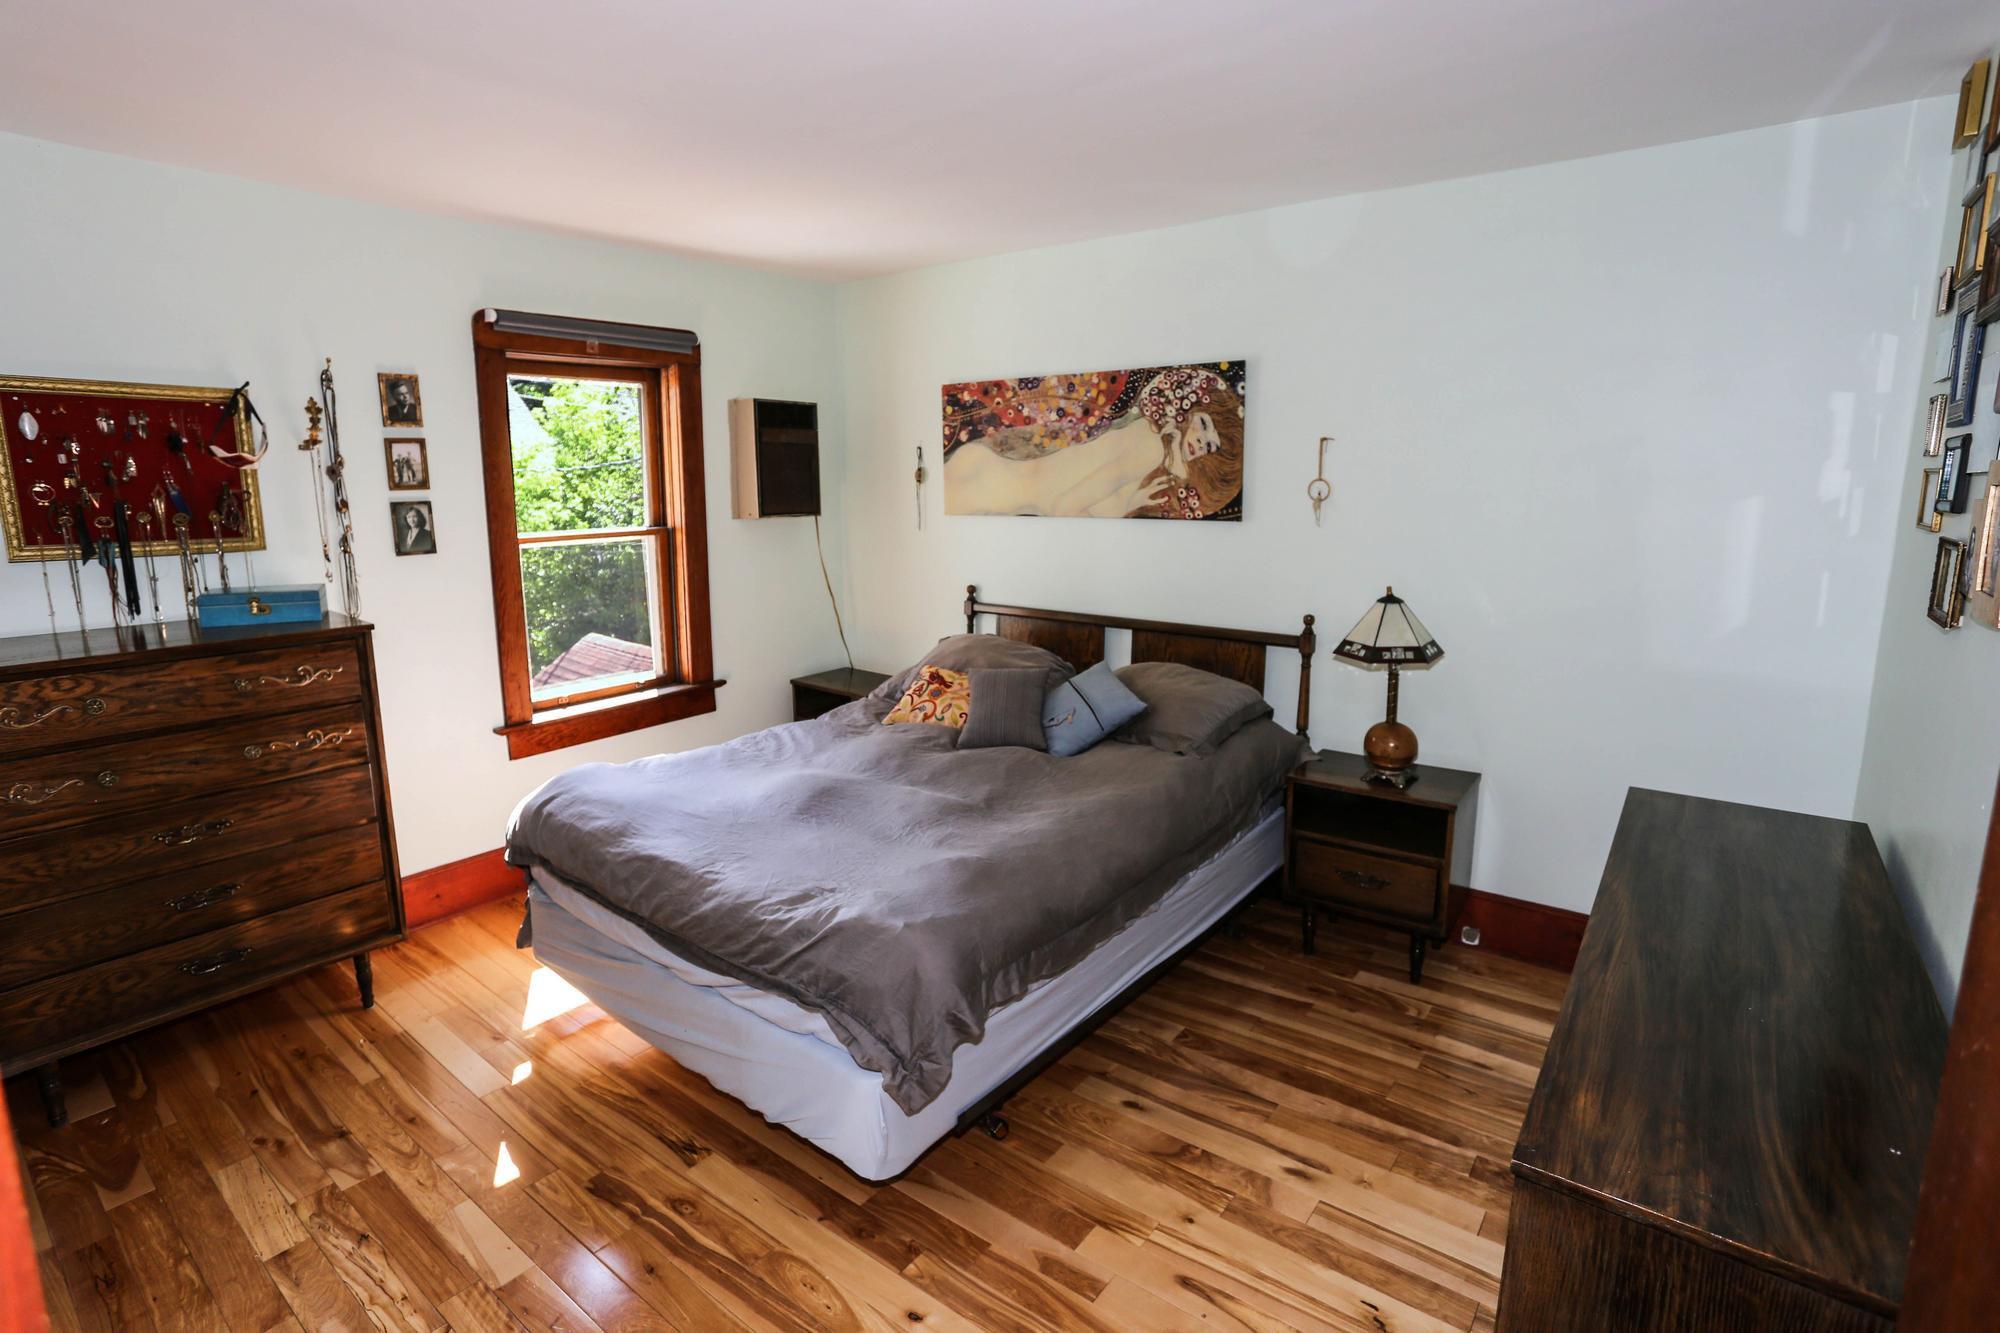 Photo 19: Photos: 105 Evanson Street in Winnipeg: Wolseley Single Family Detached for sale (5B)  : MLS®# 1821900